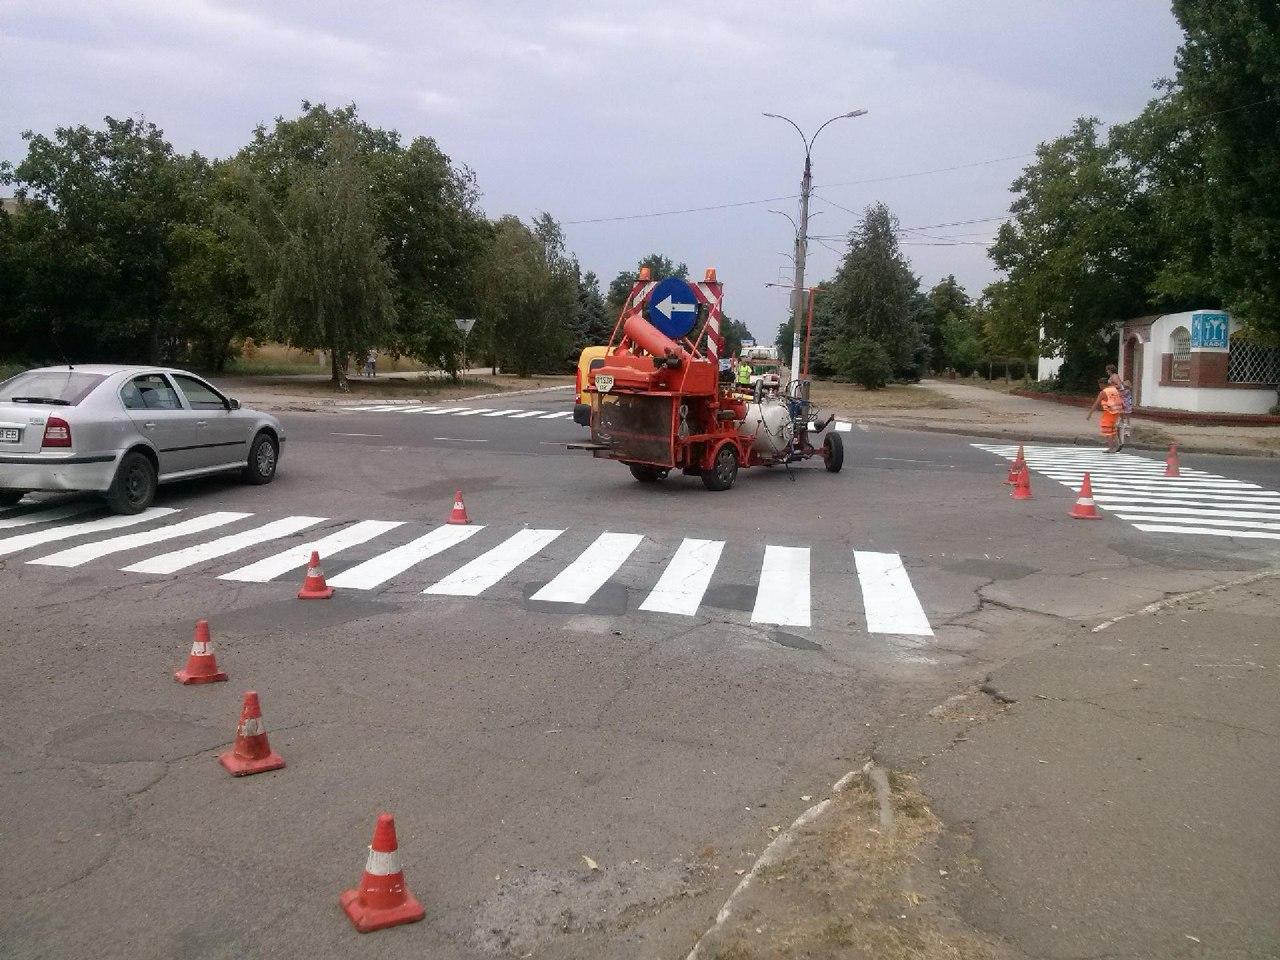 rMAVxK-BvaE В Сергеевке под конец курортного сезона ремонтируют дороги (фото)